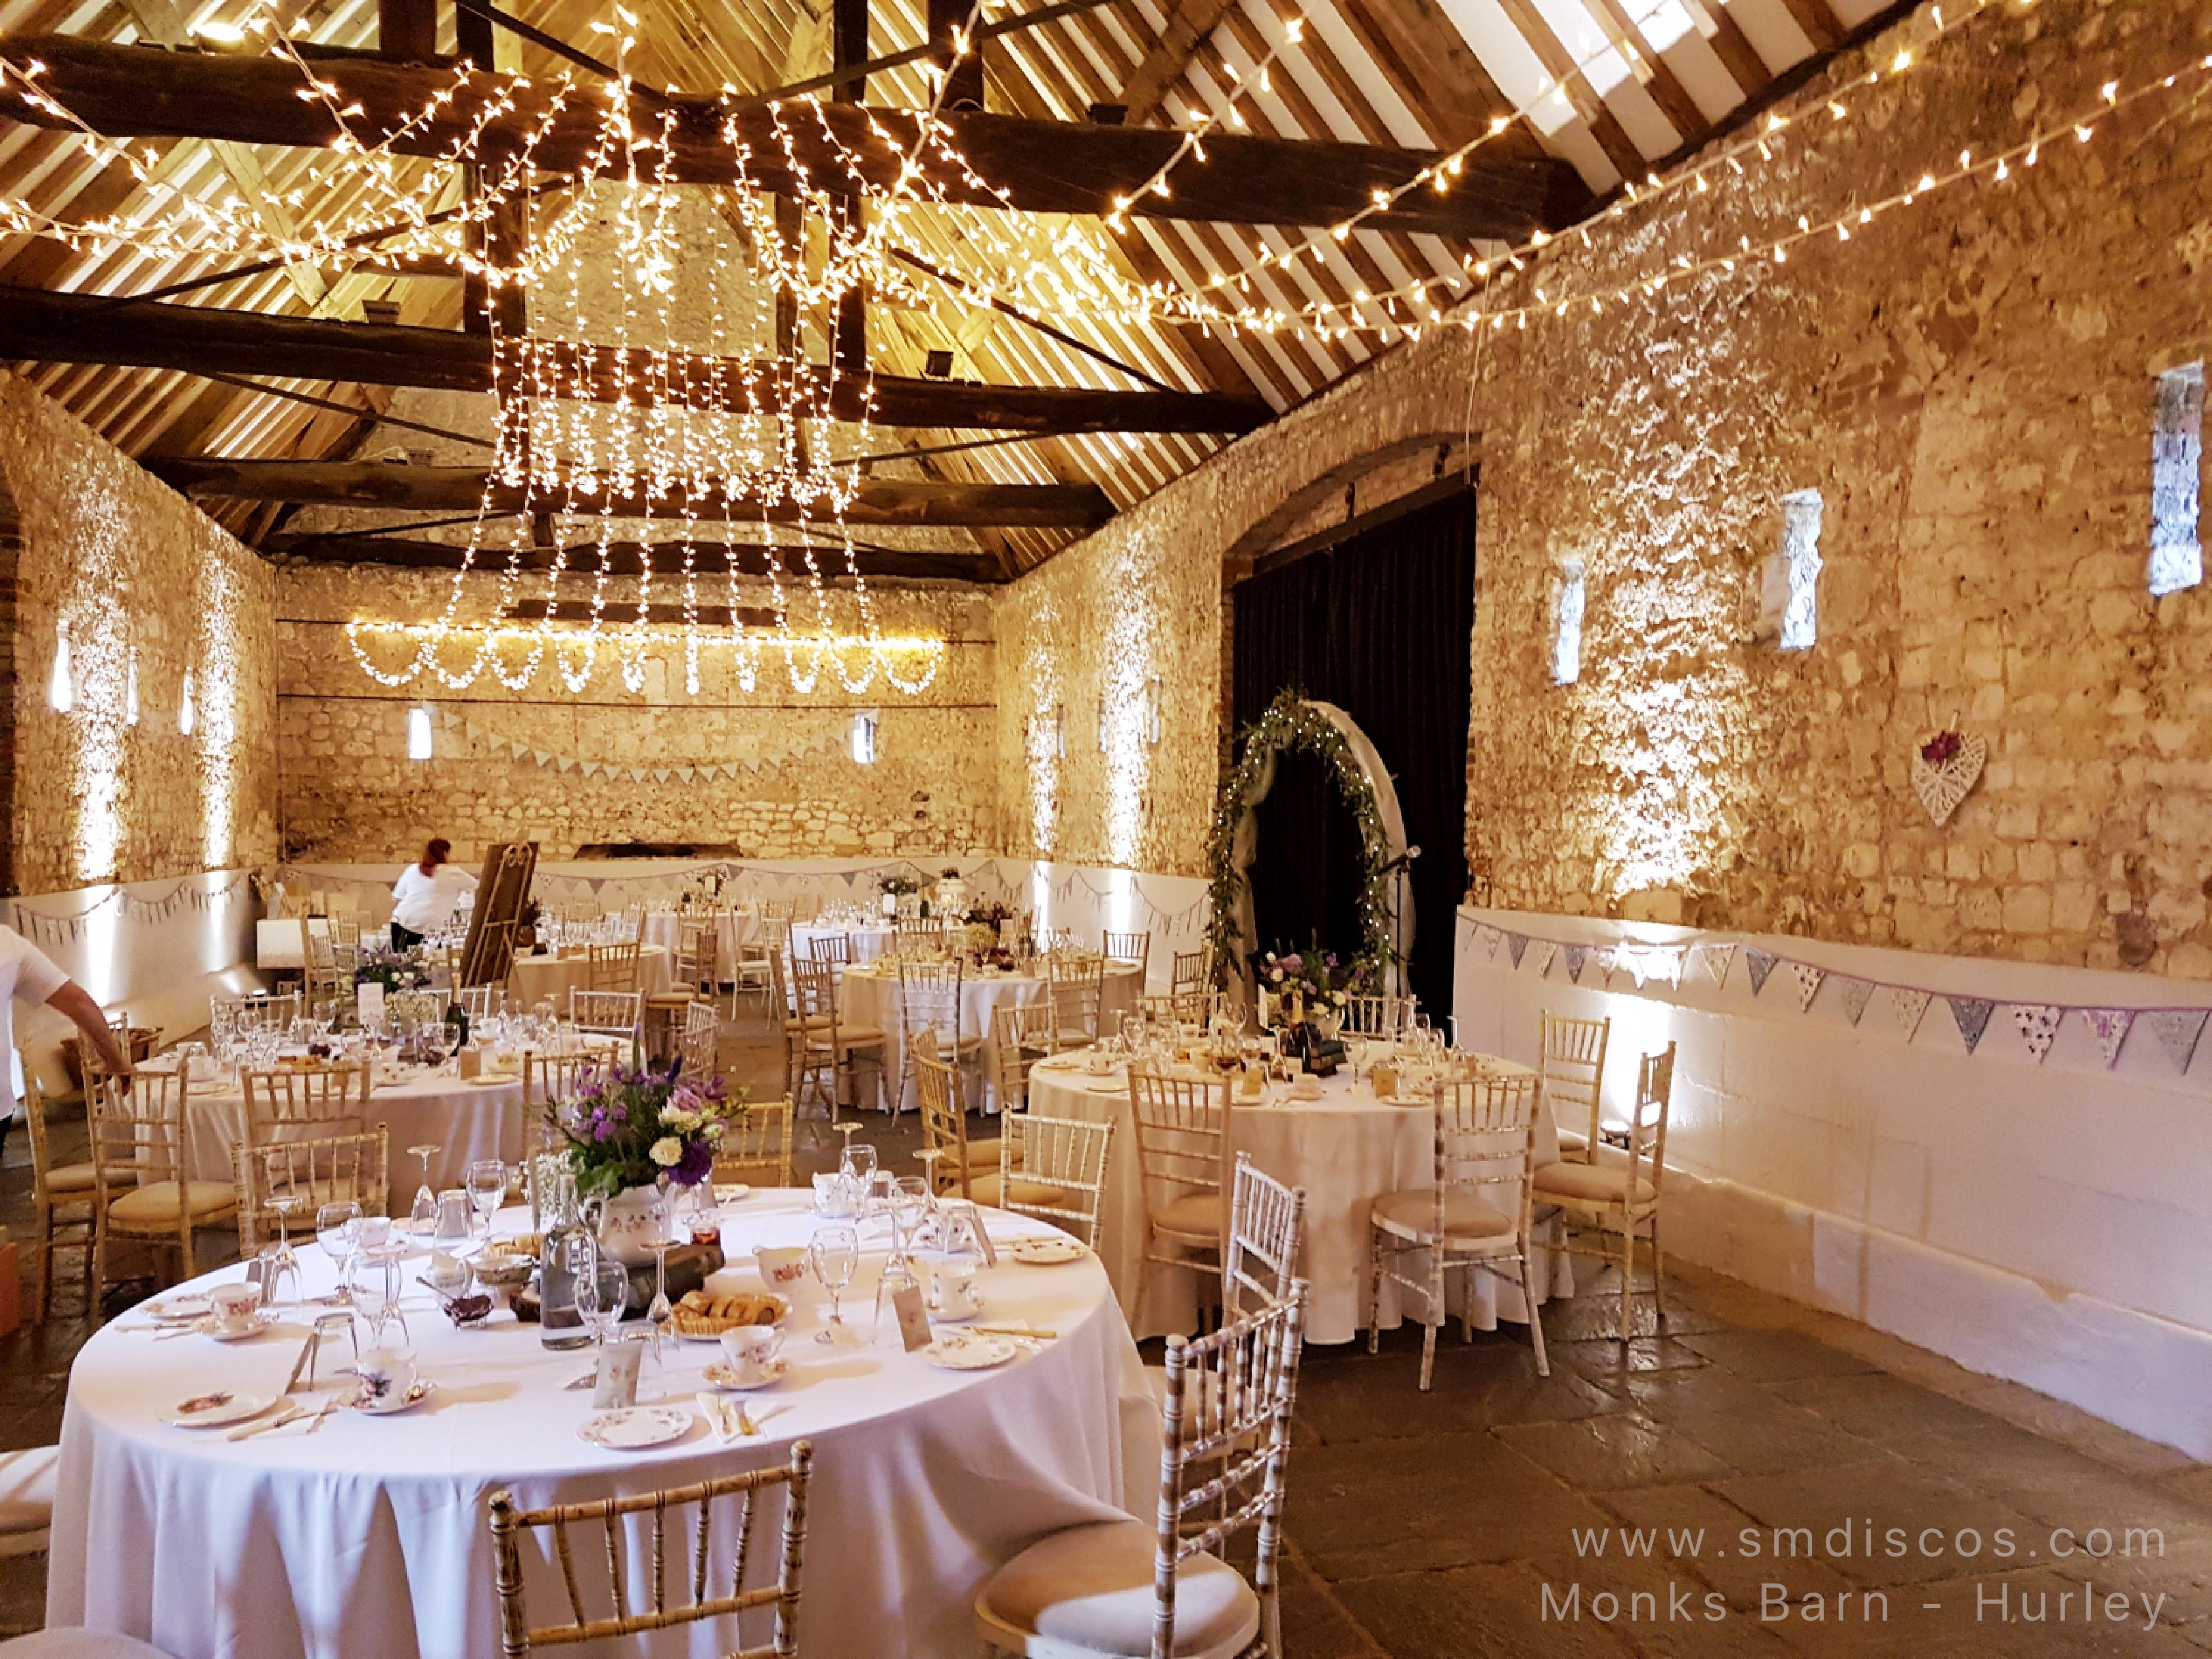 Monks Barn Wedding Venue